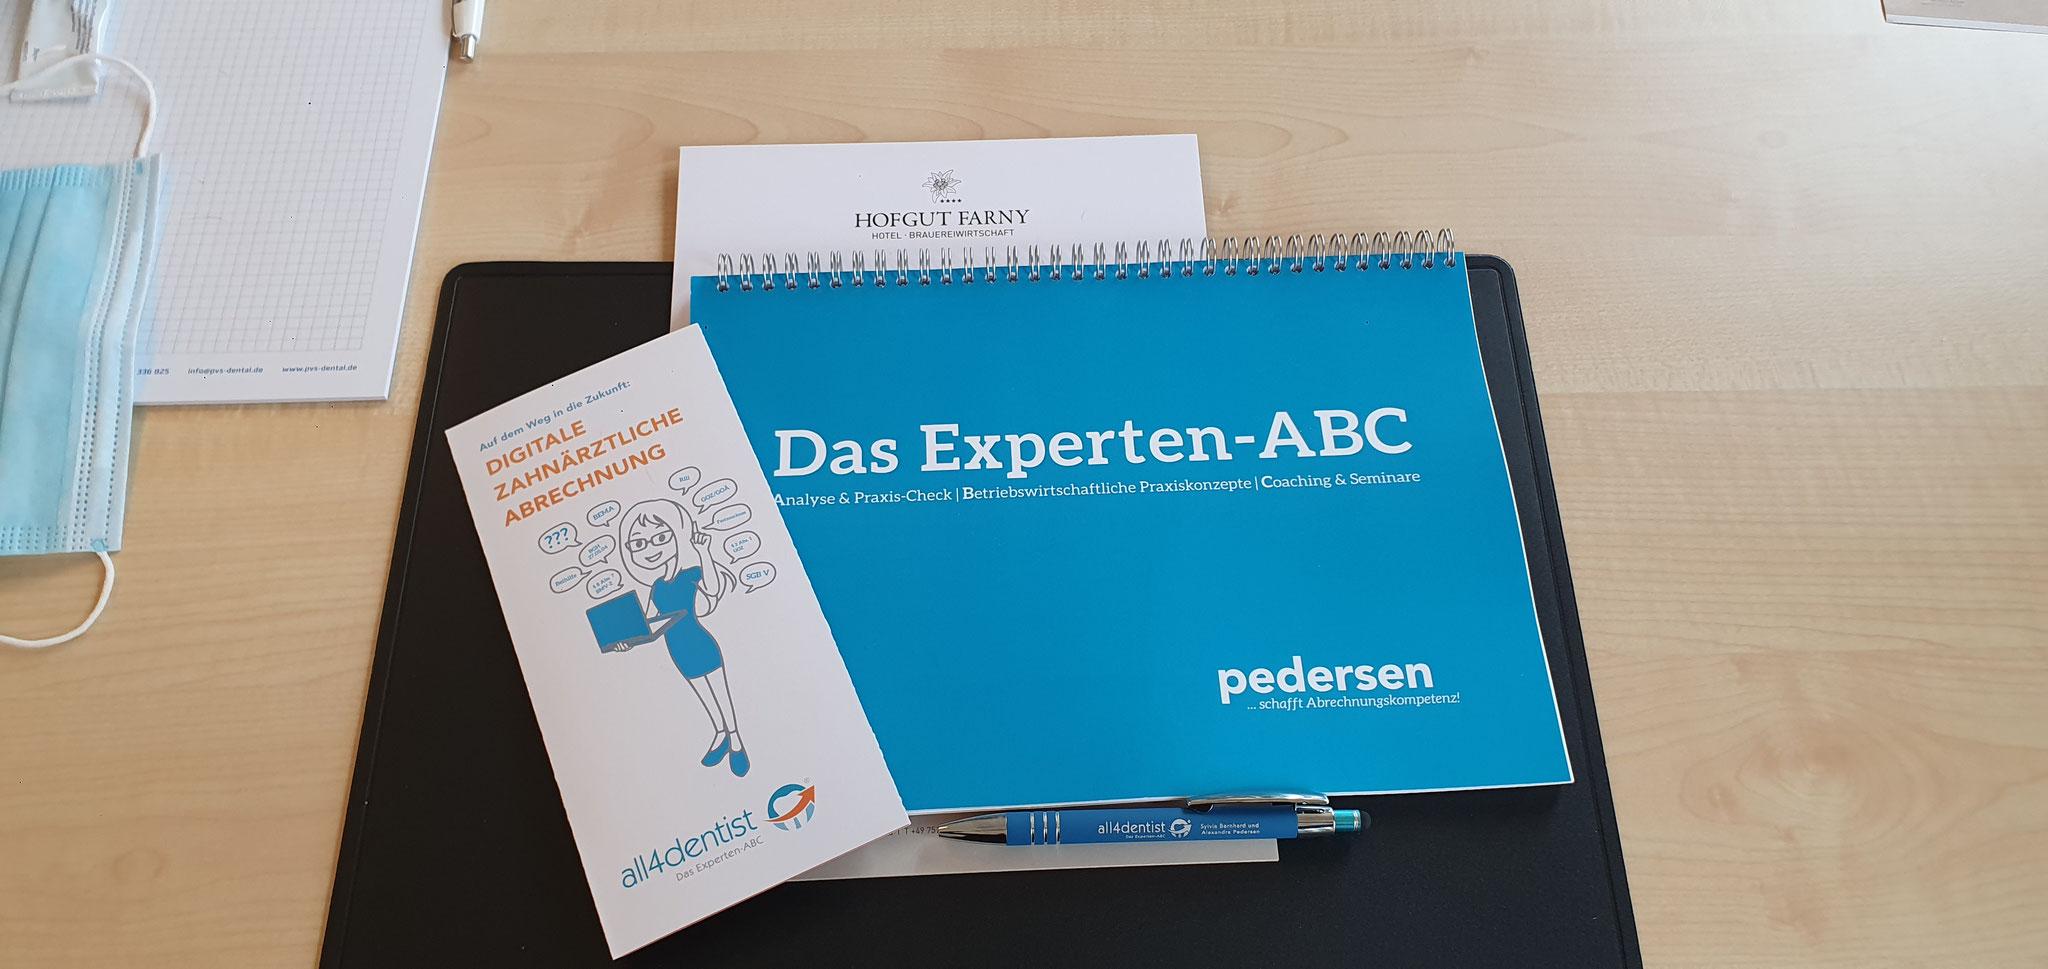 Das Experten ABC -  Alexandra Pedersen--> Pedersen Expertenwissen